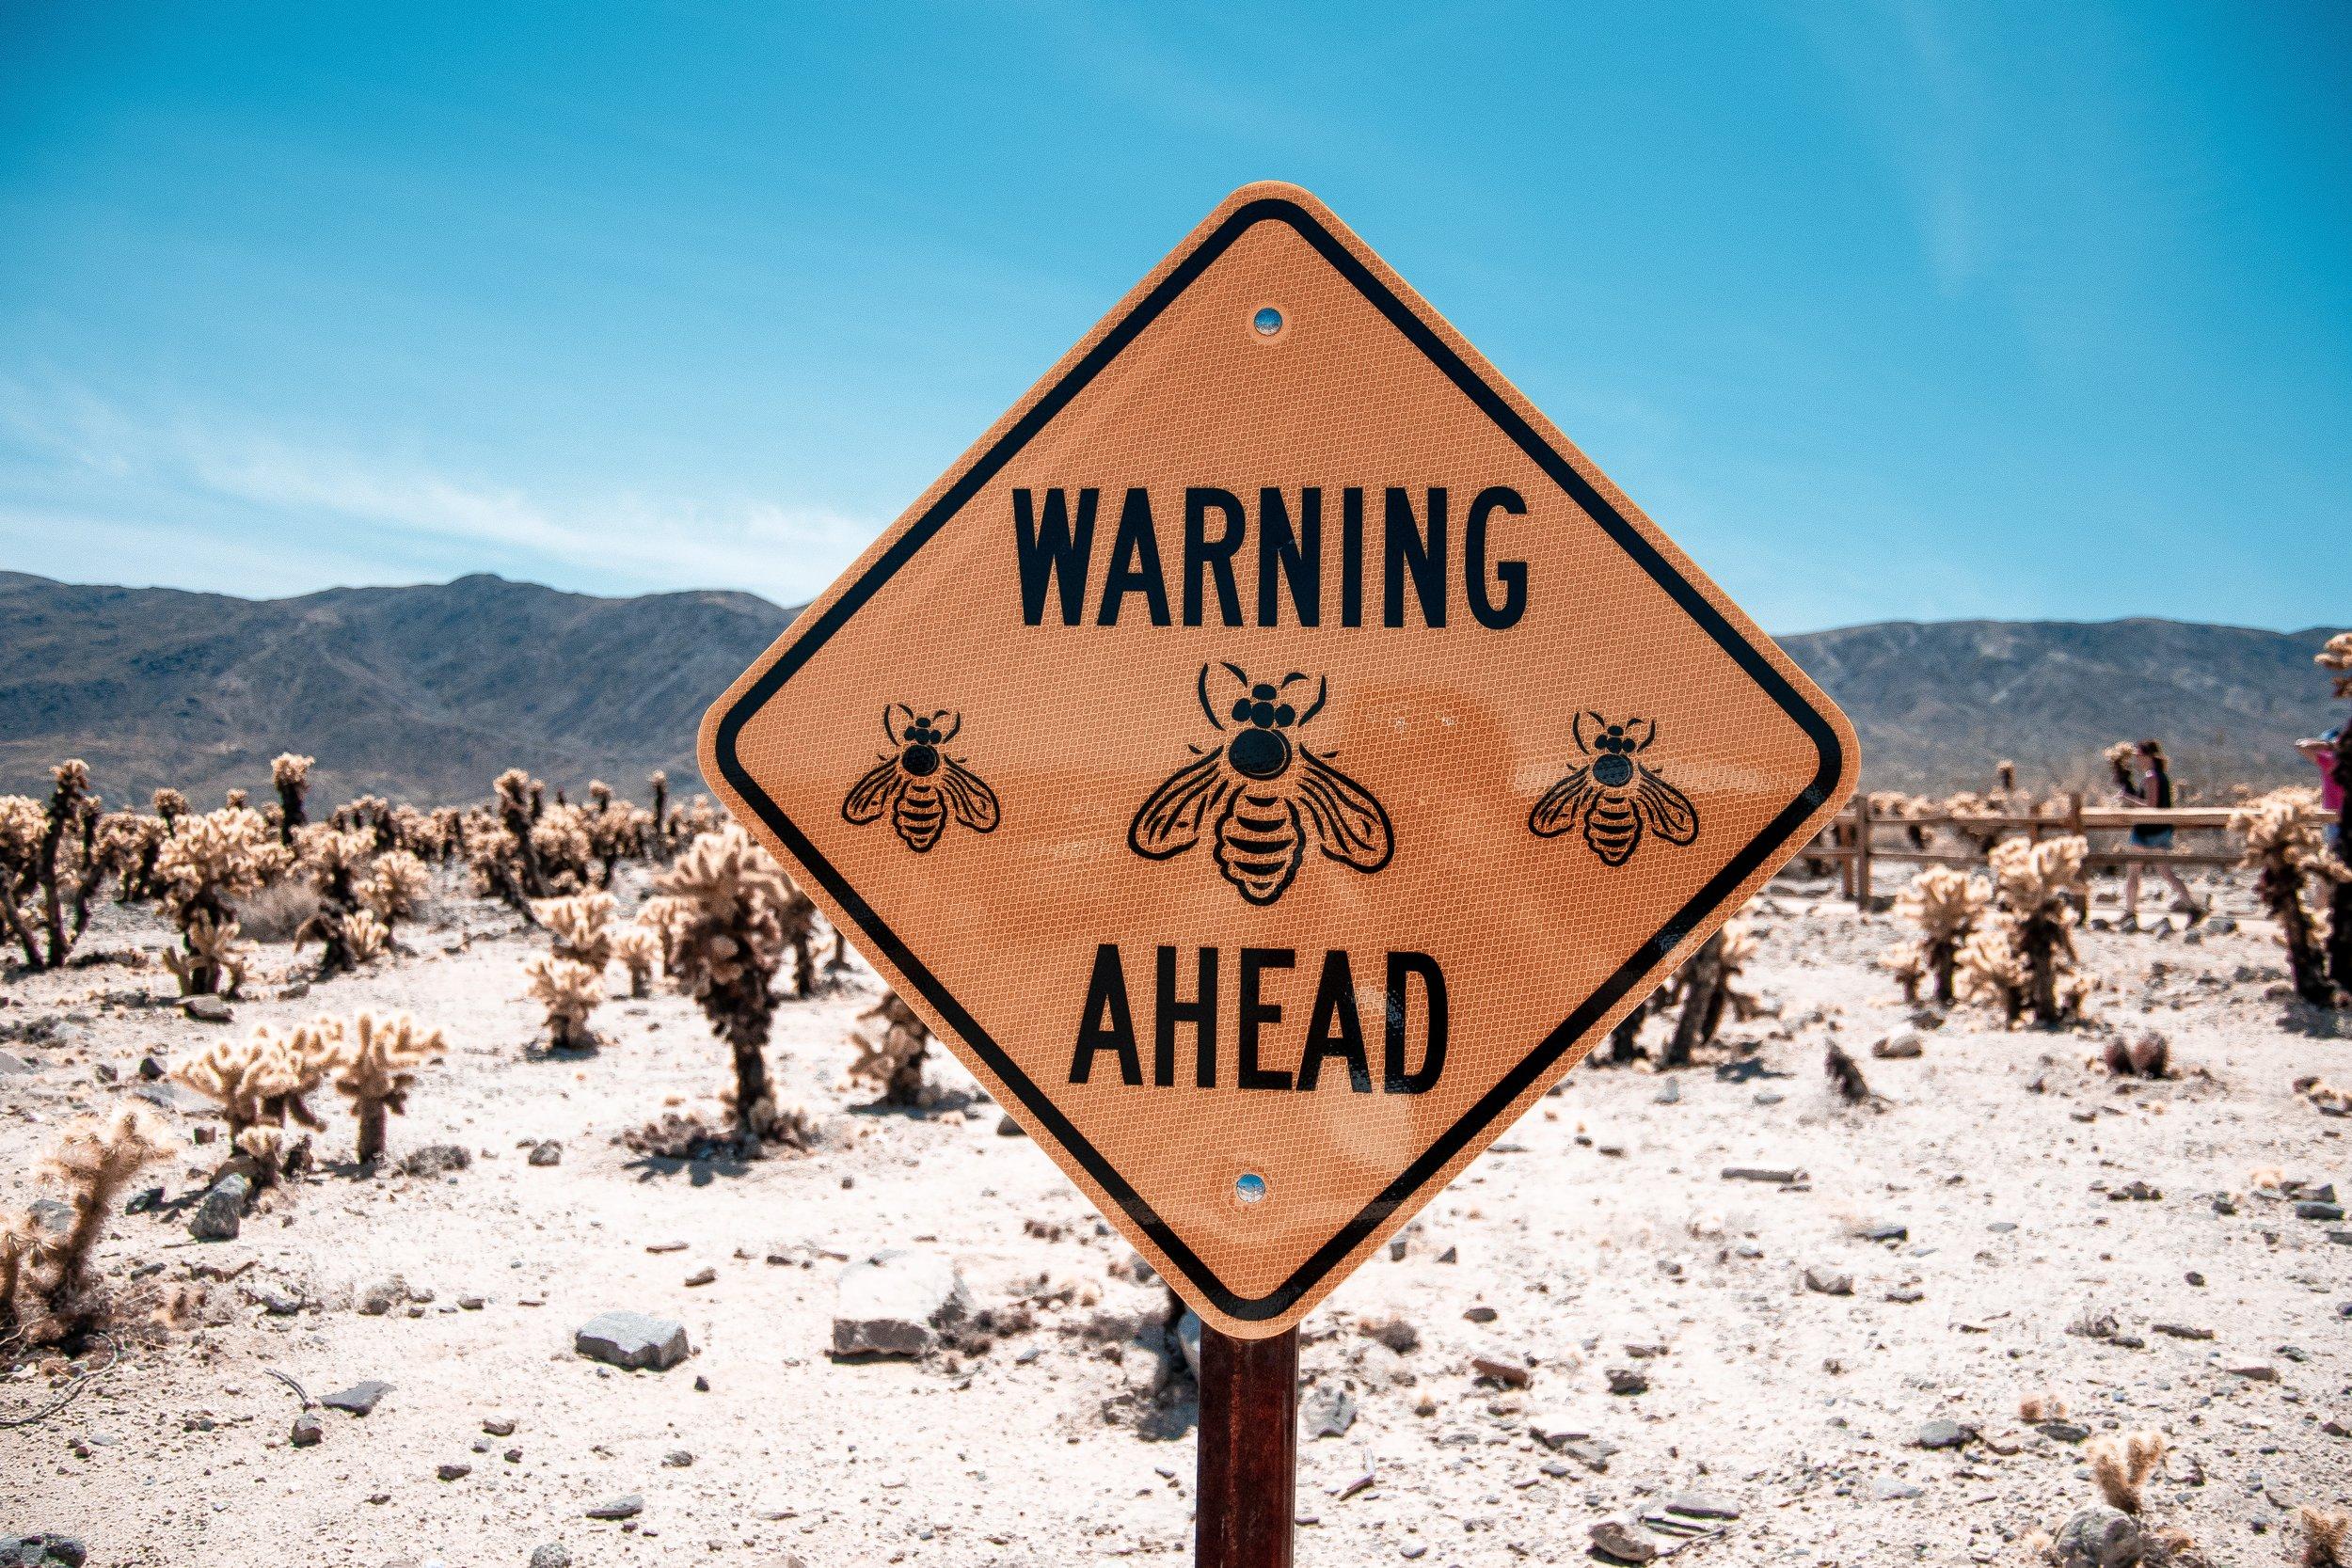 Warning ahead-hubert-mousseigne-661465-unsplash.jpg